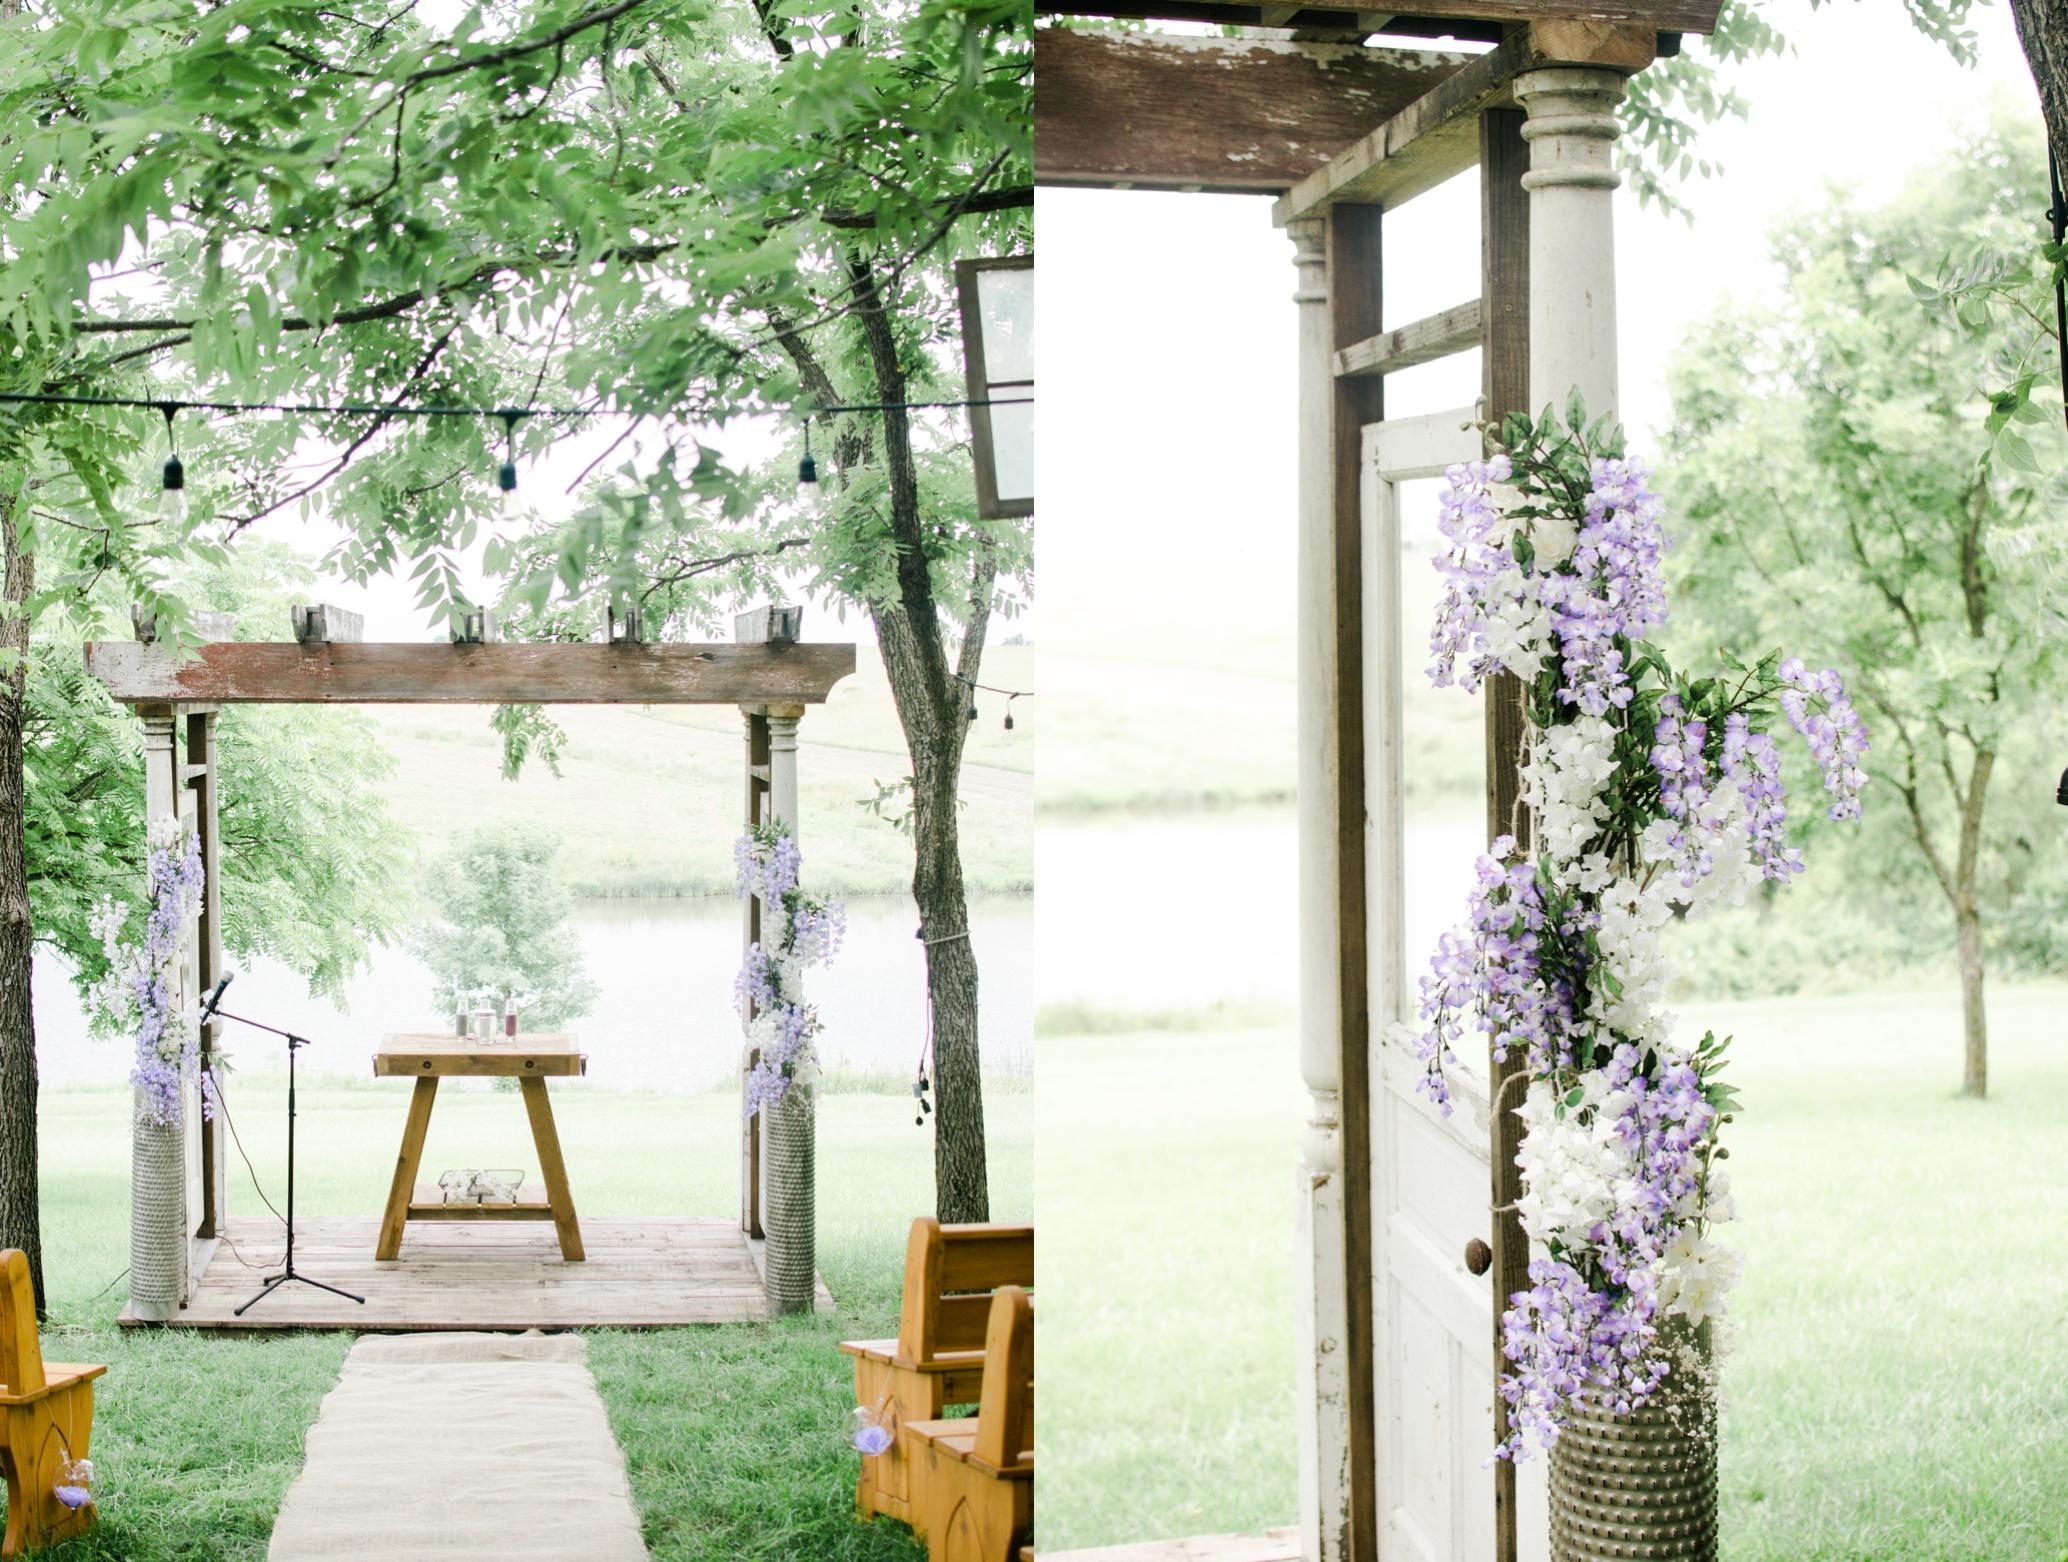 Barnes' Place Rustic Outdoor Wedding | Ali Leigh Photo Minneapolis Wedding Photographer_0128.jpg